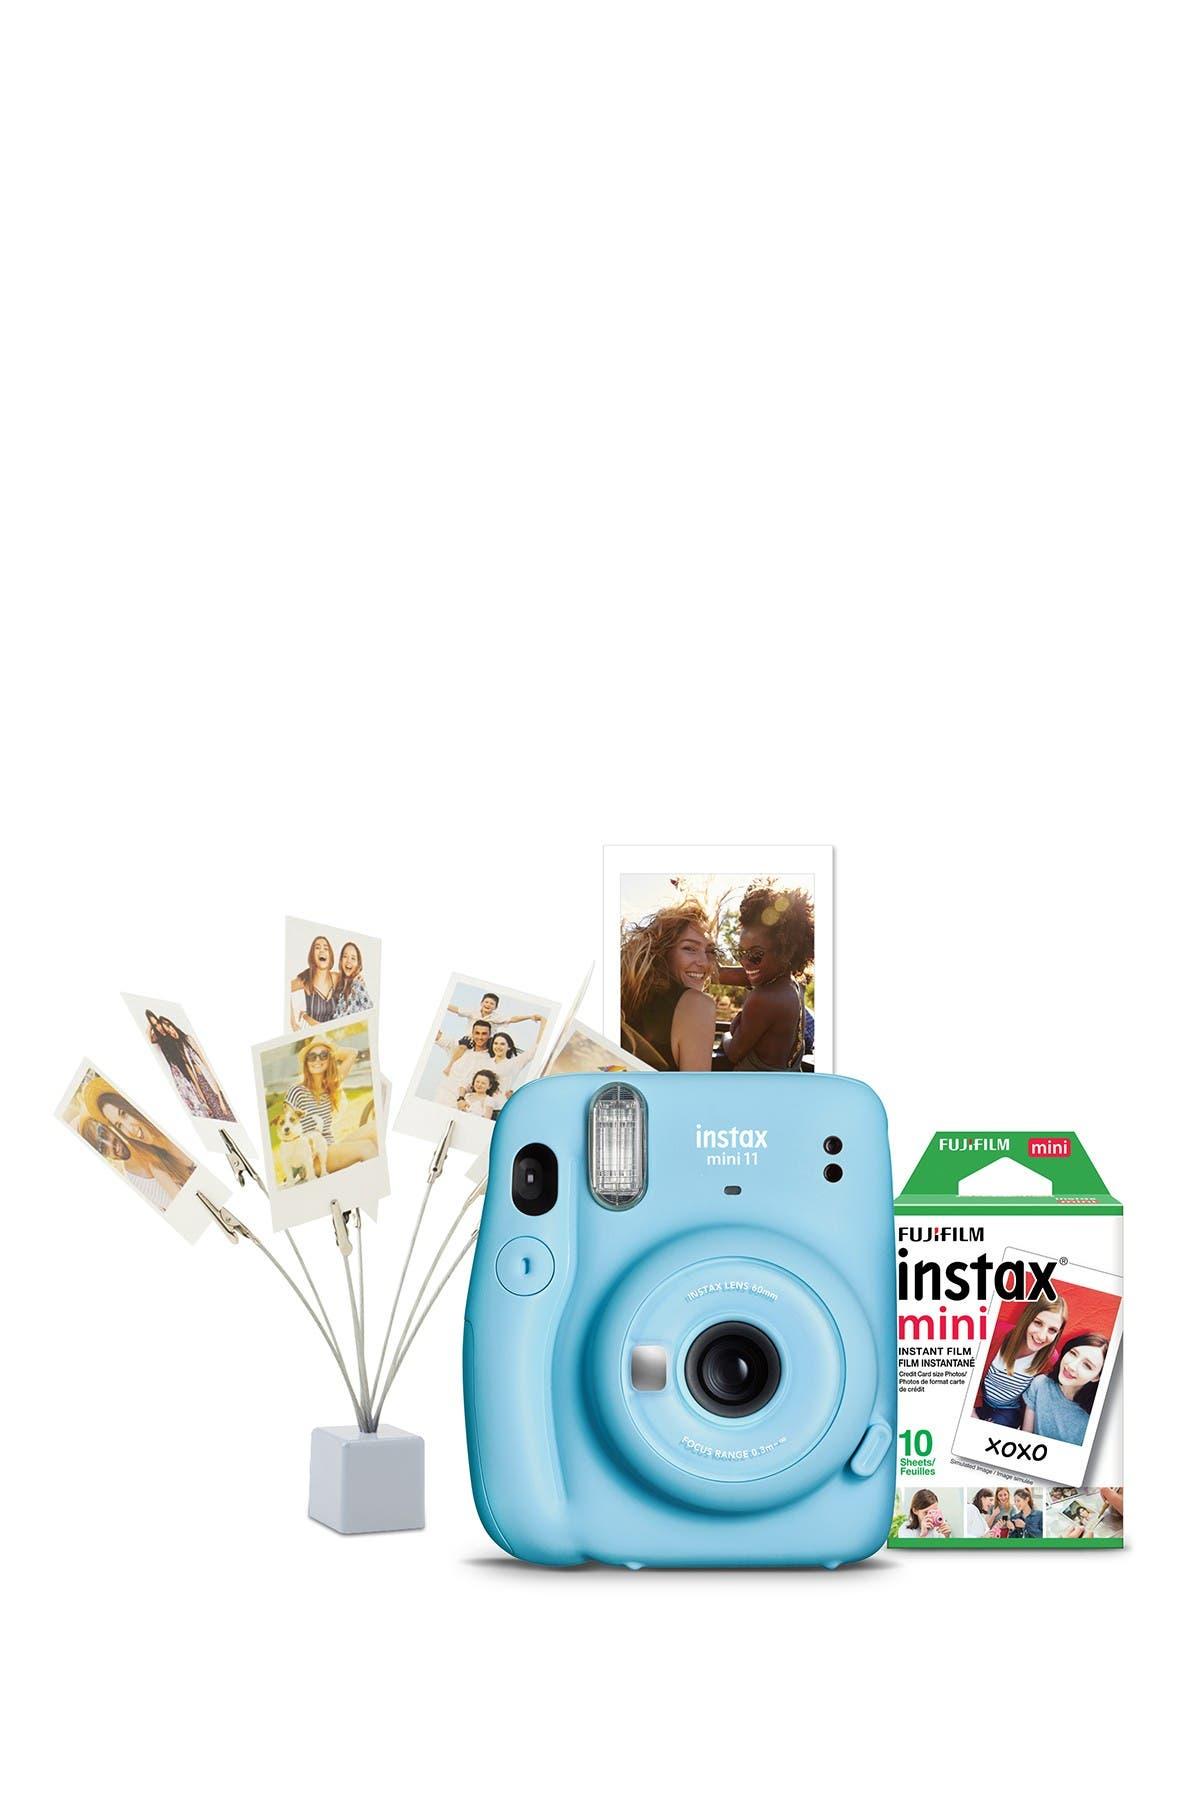 Image of INSTAX MINI BY FUJIFILM Fujifilm Instax Mini 11 Camera Bundle - Sky Blue